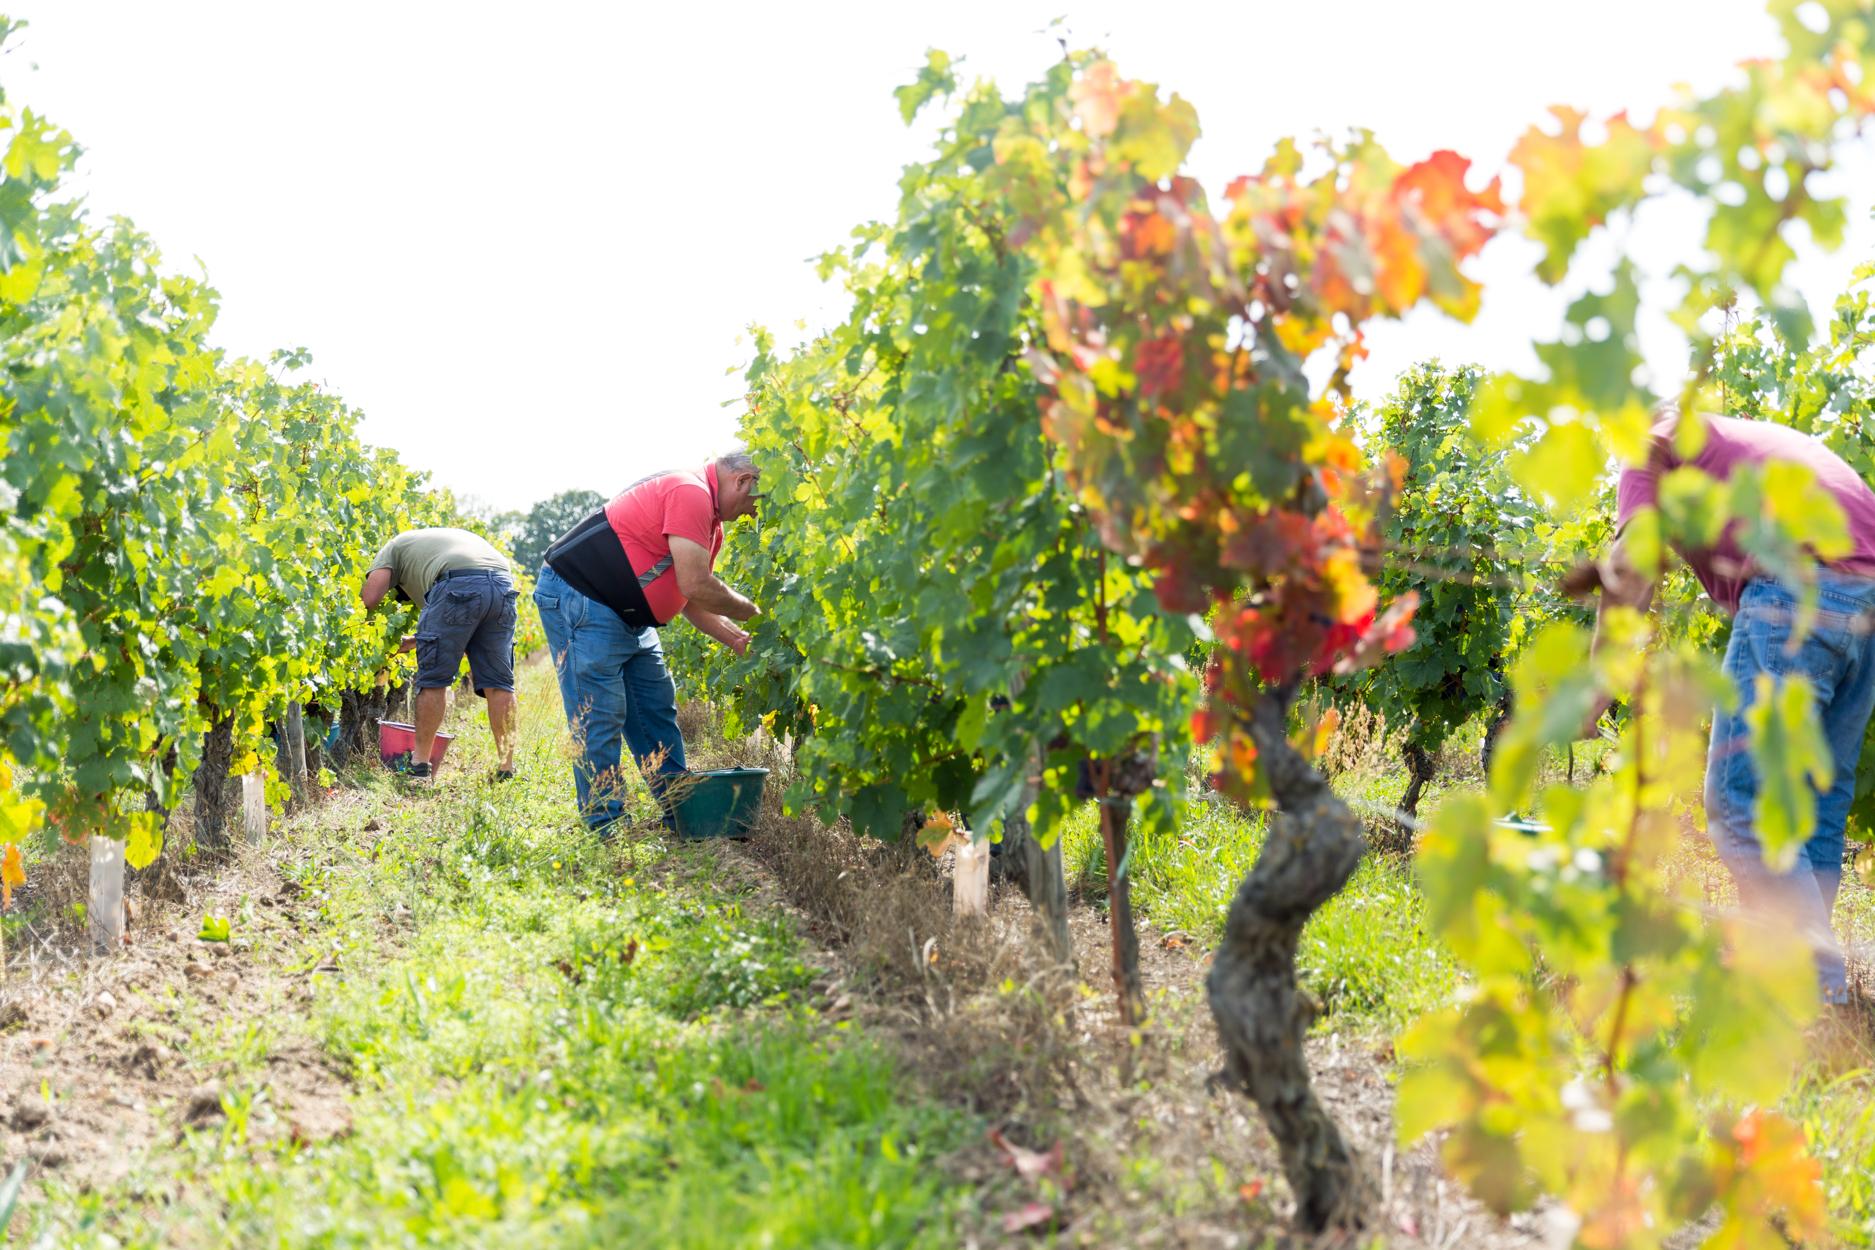 Domaine-caslot-Bourdin-Vin-de-Bourgueil-37-©gaellebc-JPGWEB-058